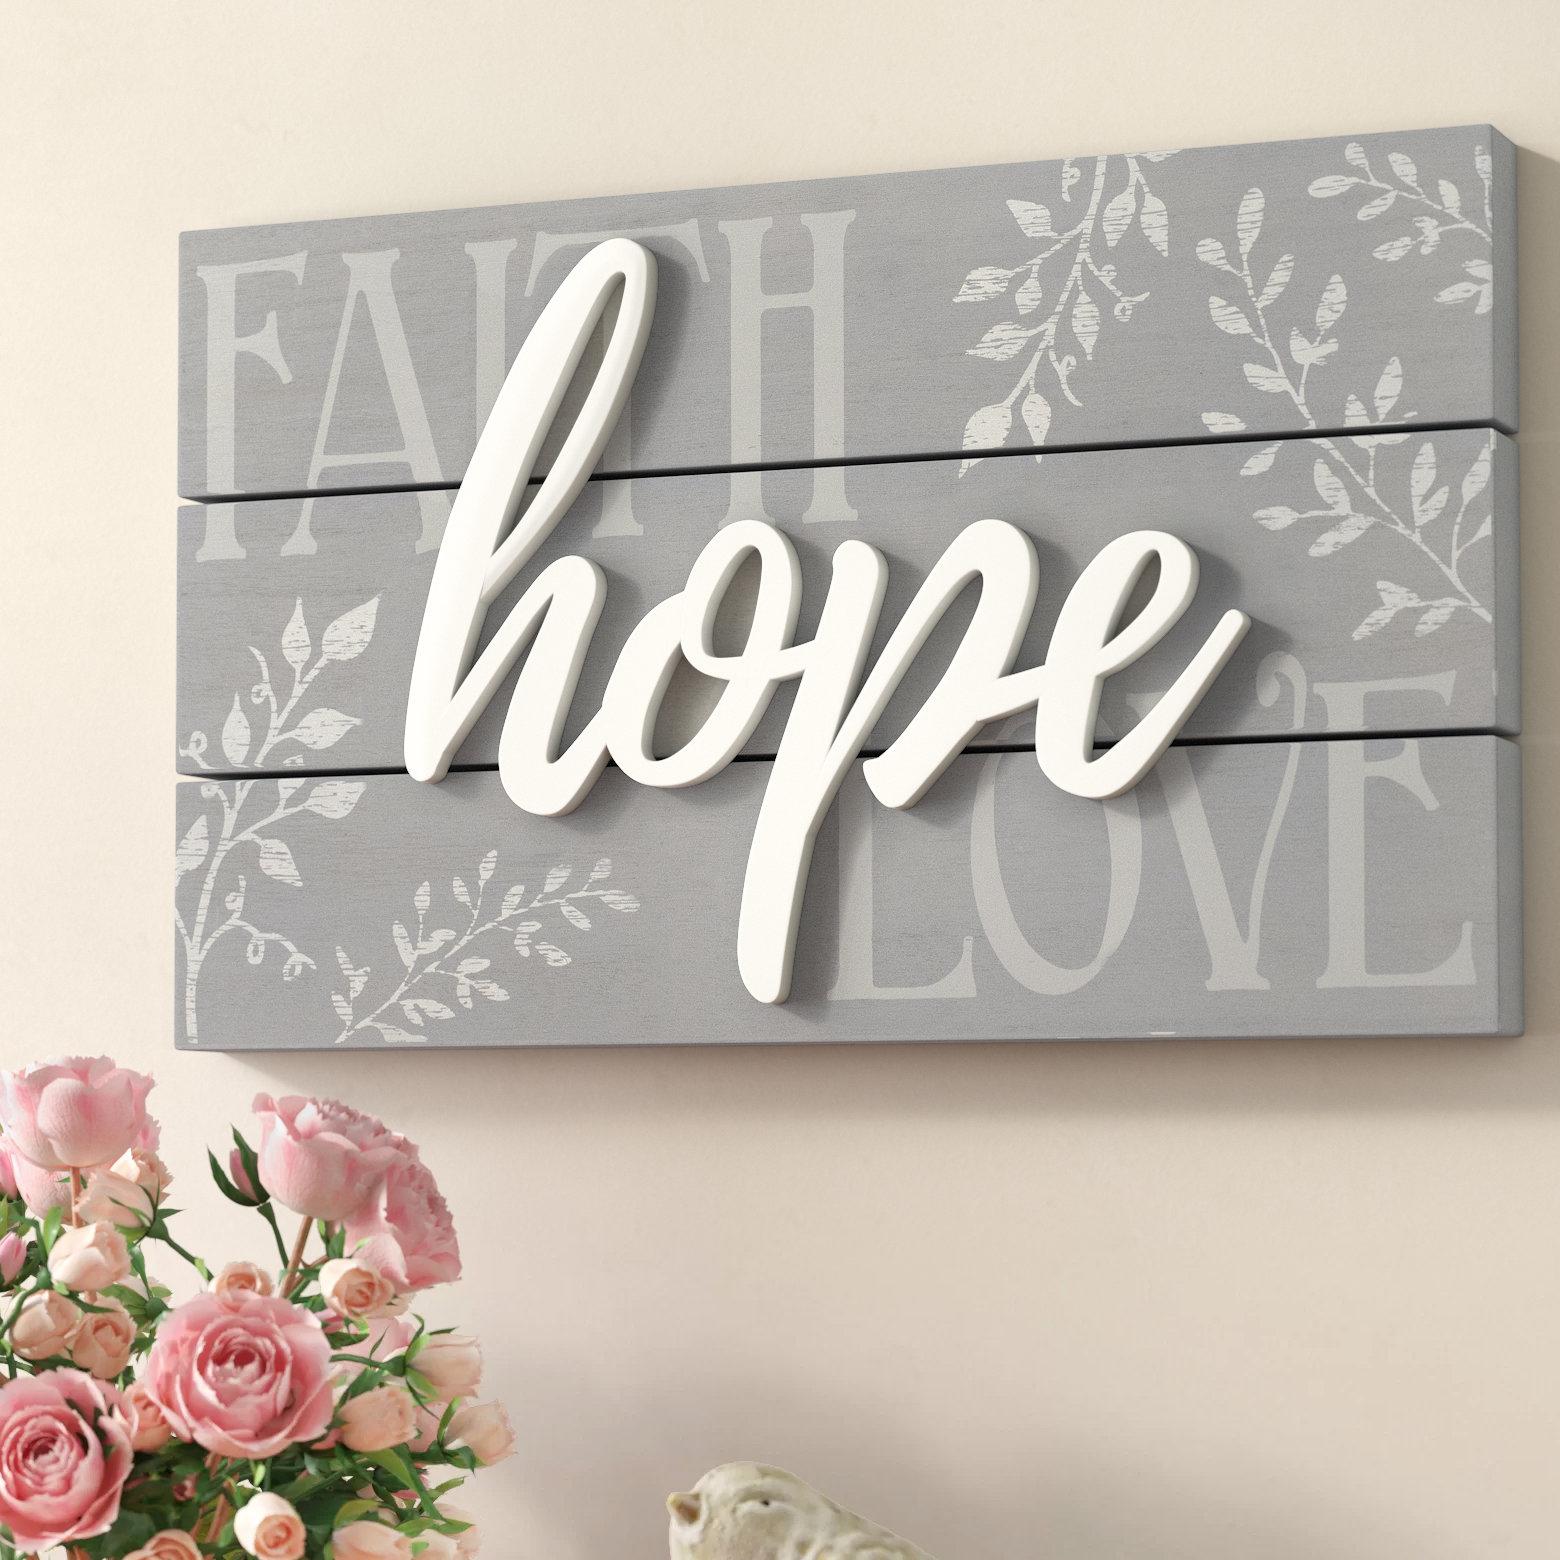 Featured Photo of Faith, Hope, Love Raised Sign Wall Decor